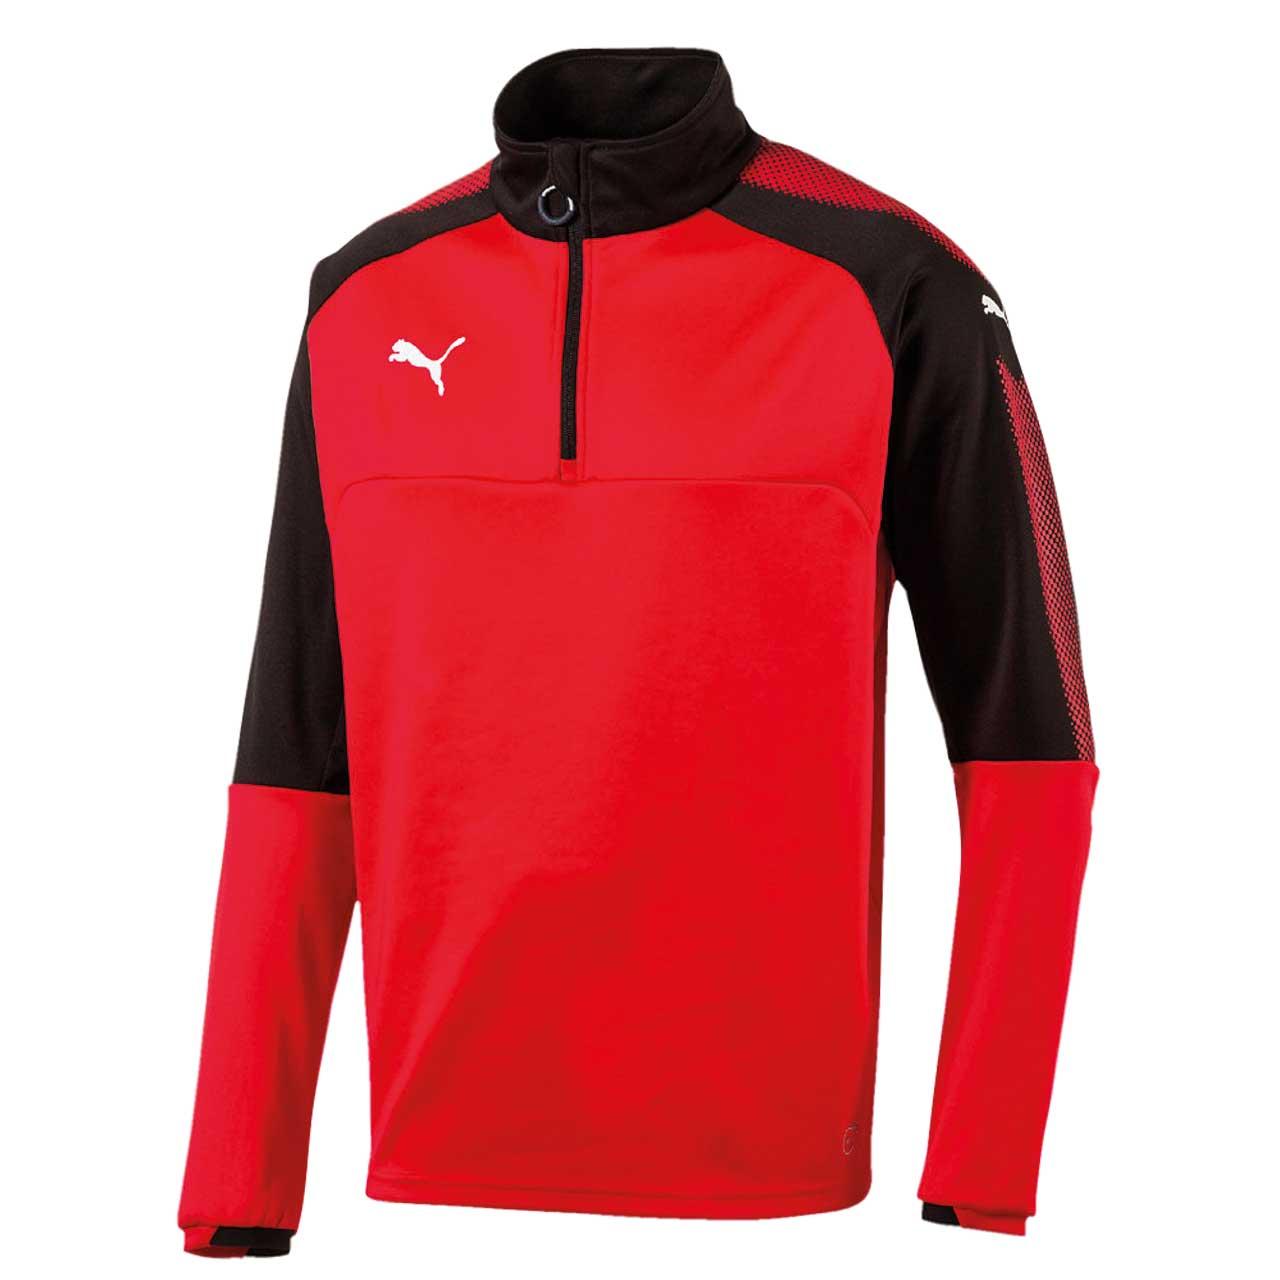 Ascension   Puma   Marken   Sport HAAS - Online b9ceaba3bb